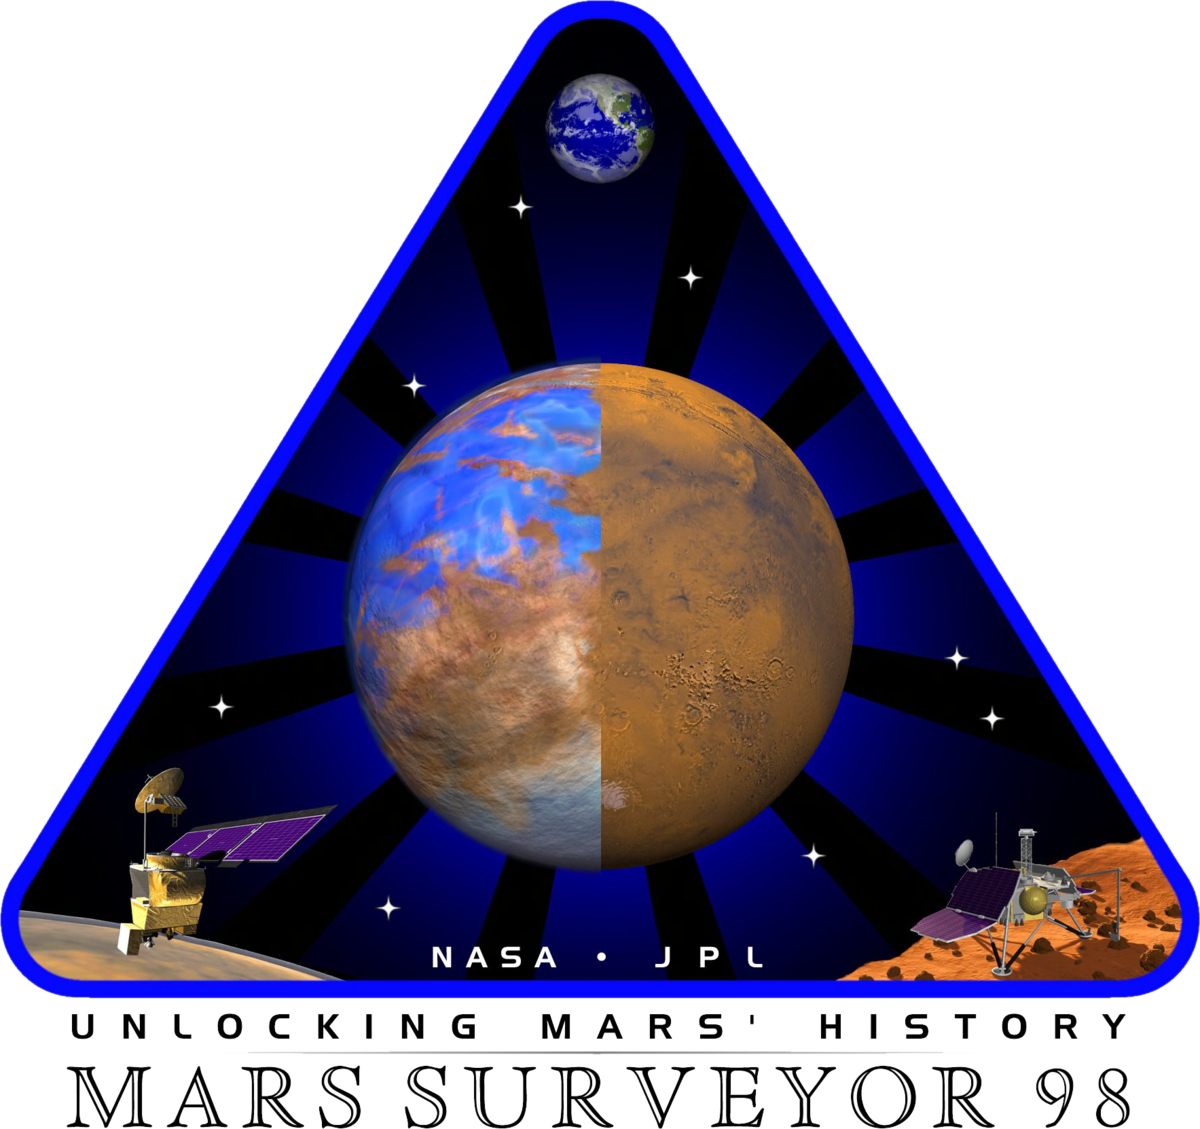 why did the mars polar lander crash in 1999